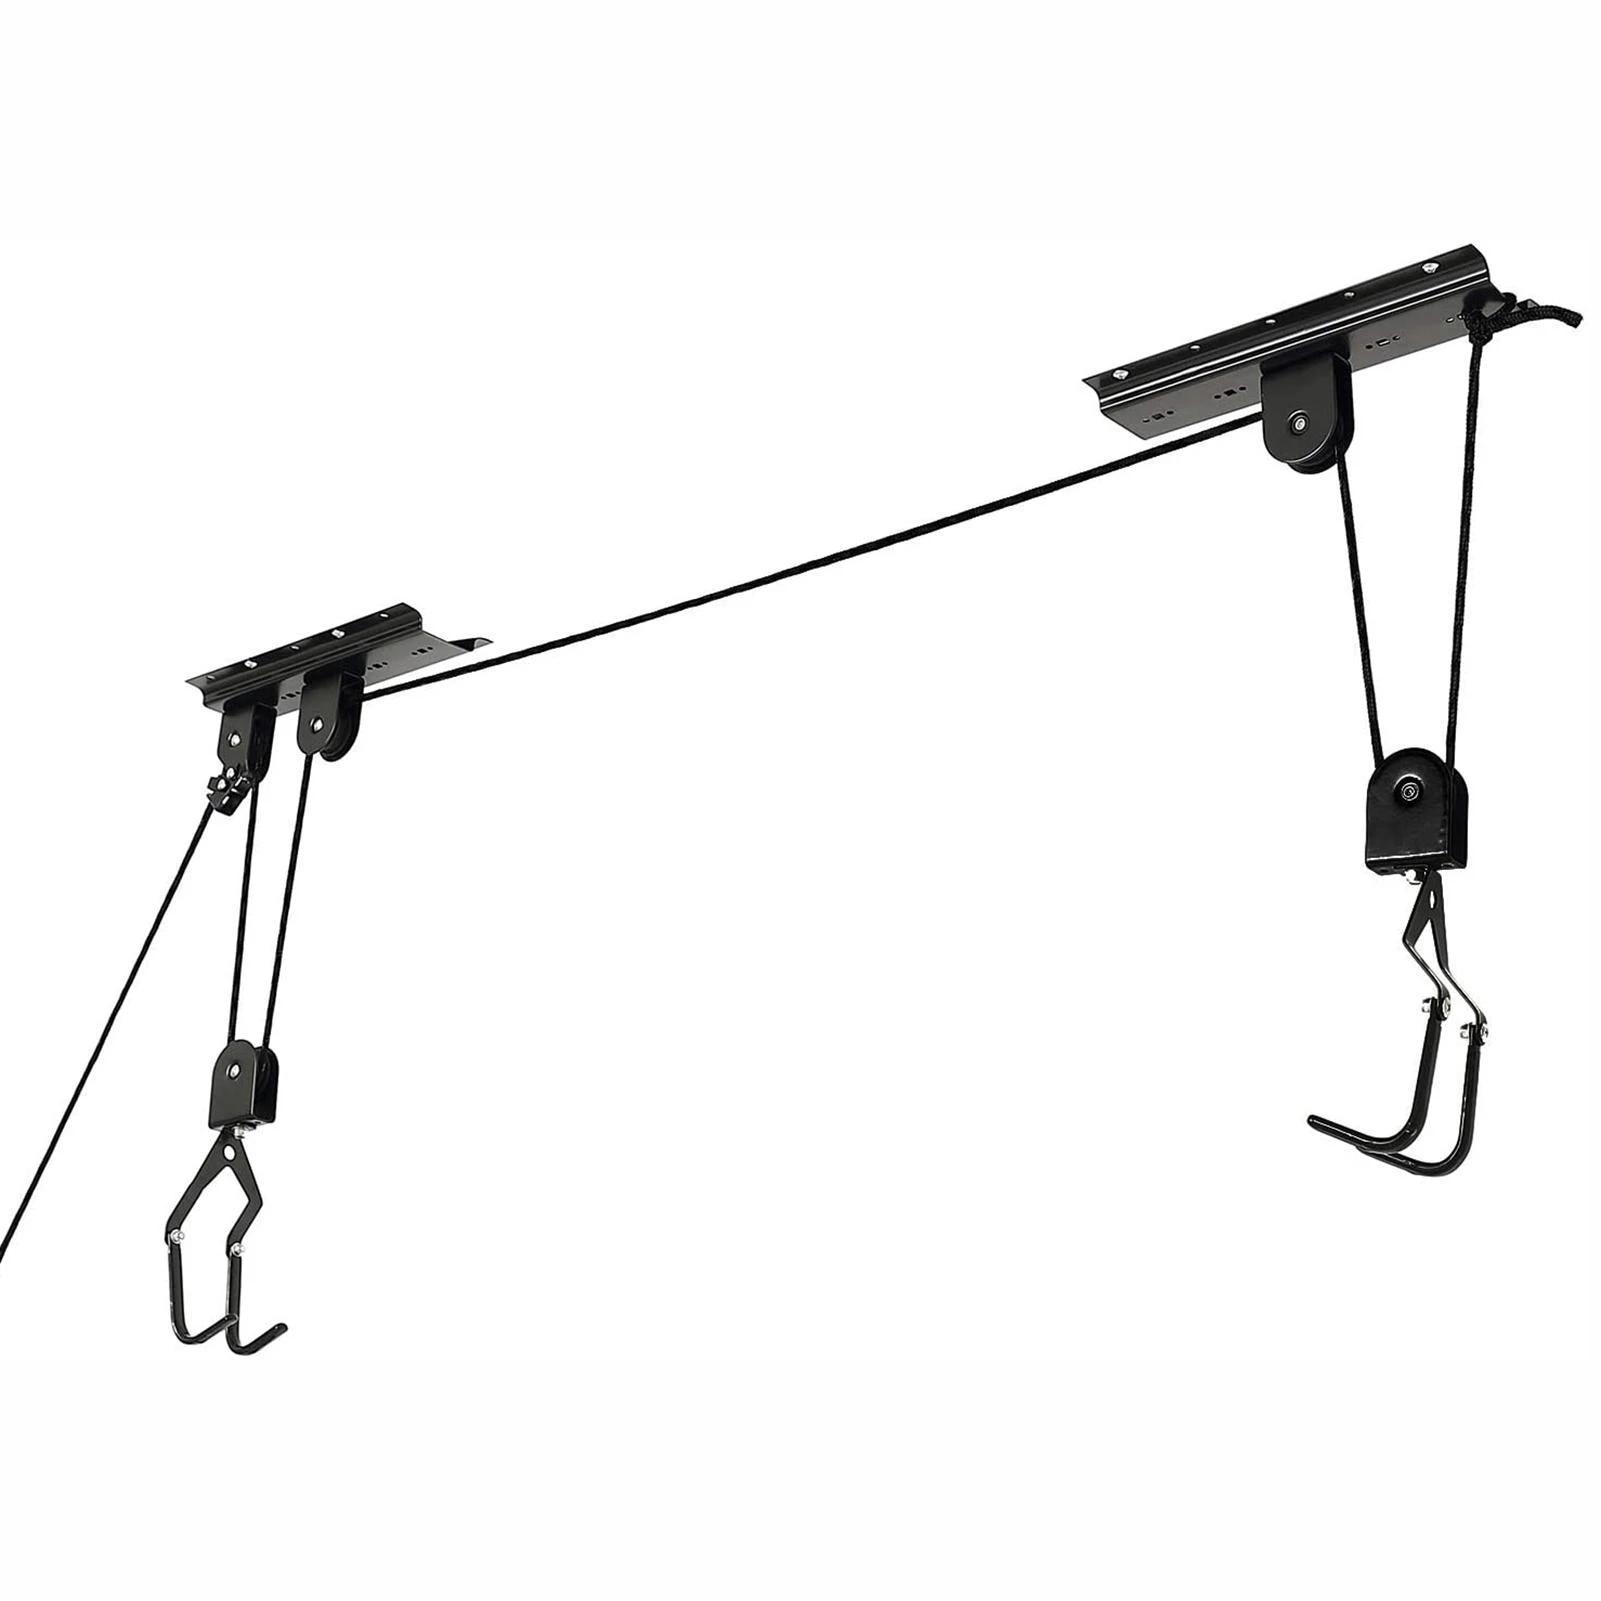 bike lift bicycle hanging display rack for garage ceiling storage with hook rope